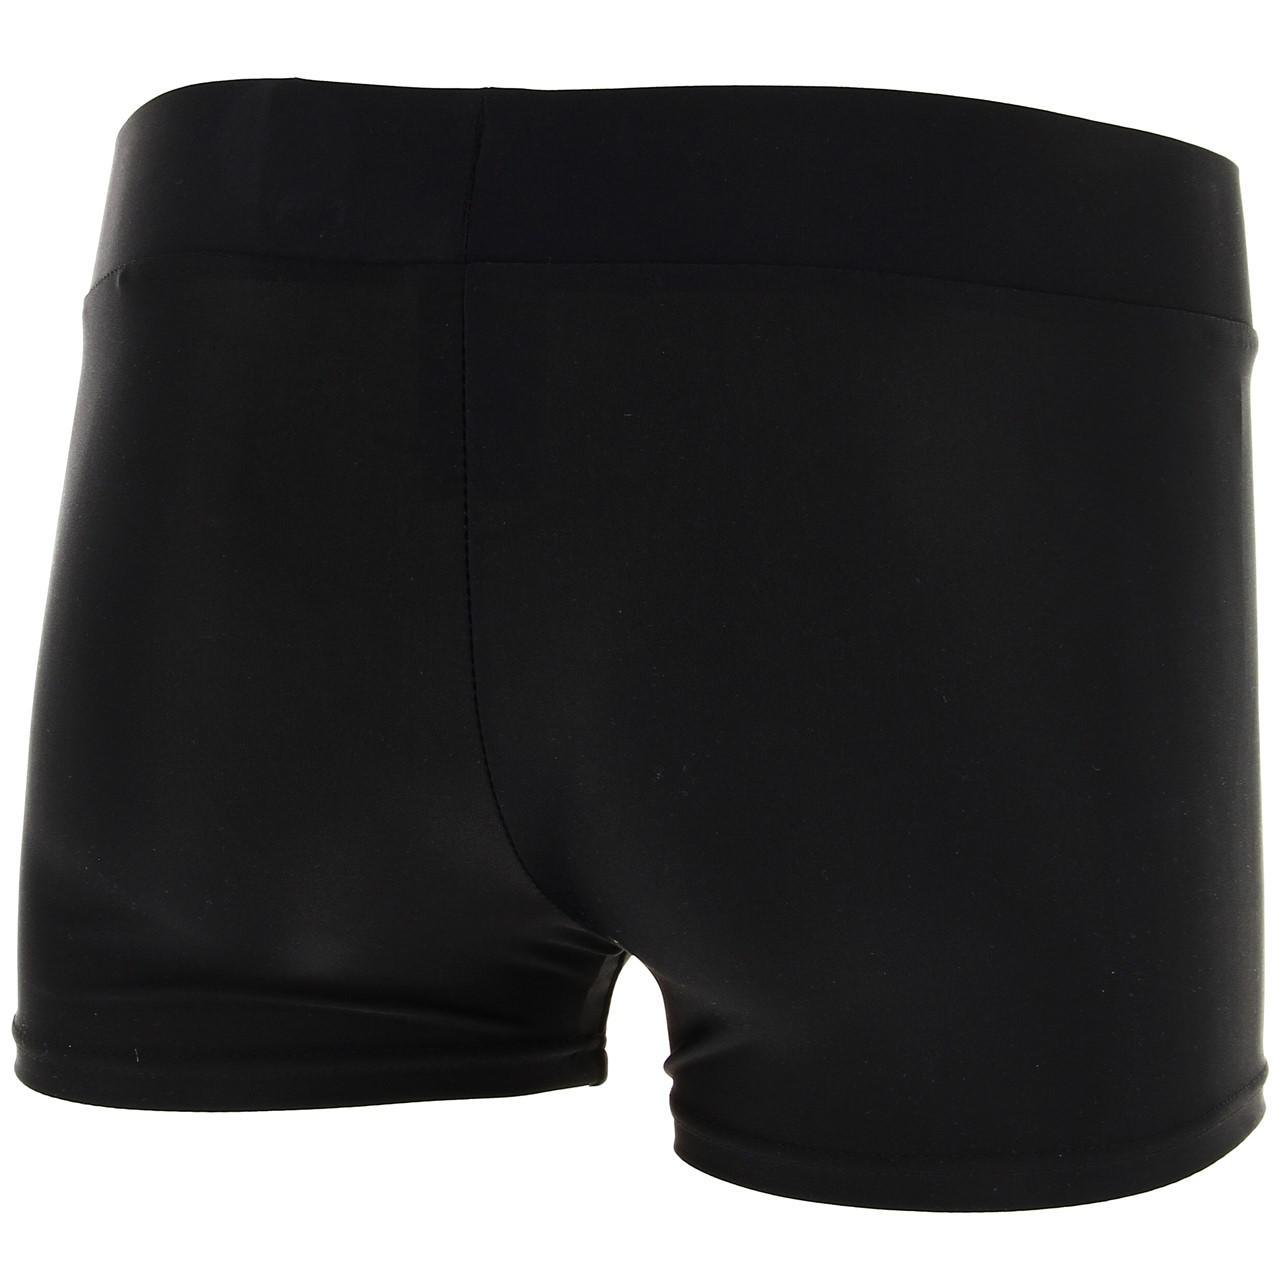 Maillot-de-bain-boxer-Freegun-Bi-noir-trq-boxer-bain-jr-Noir-59919-Neuf